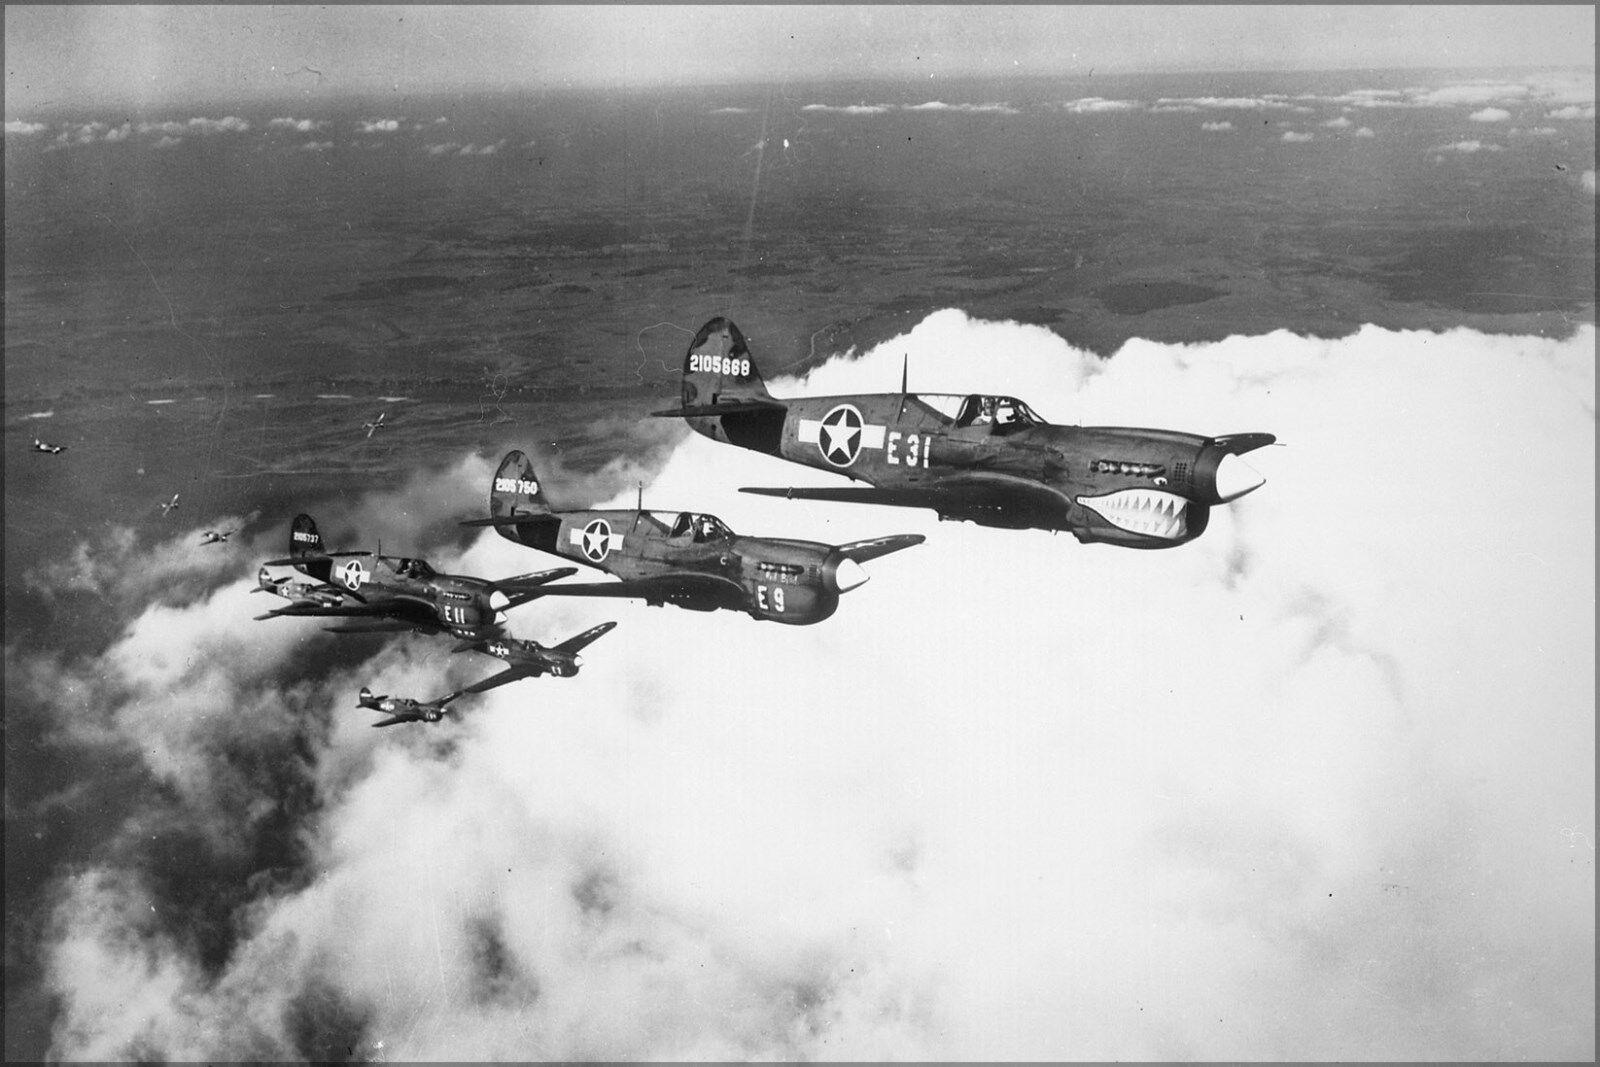 Poster, Many Größes; Shark-Nosed P-40 Warhawk Fighter Aircraft 1943